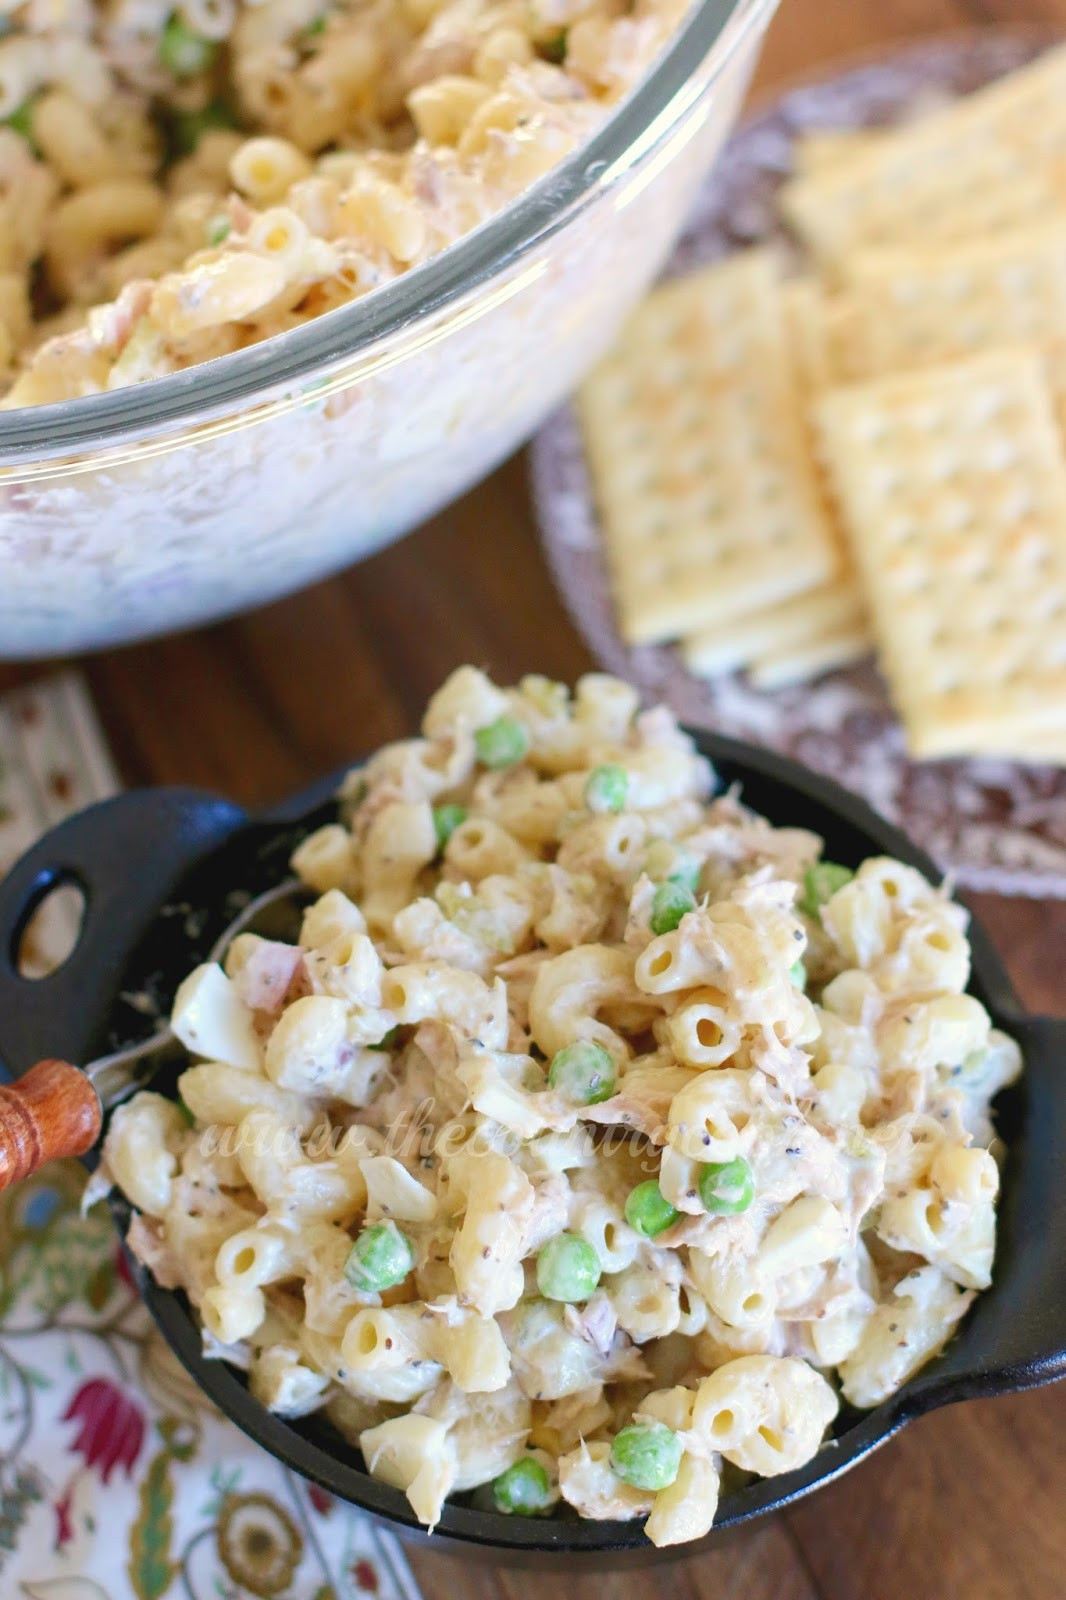 Macaroni Salad With Tuna  Tuna Macaroni Salad The Country Cook